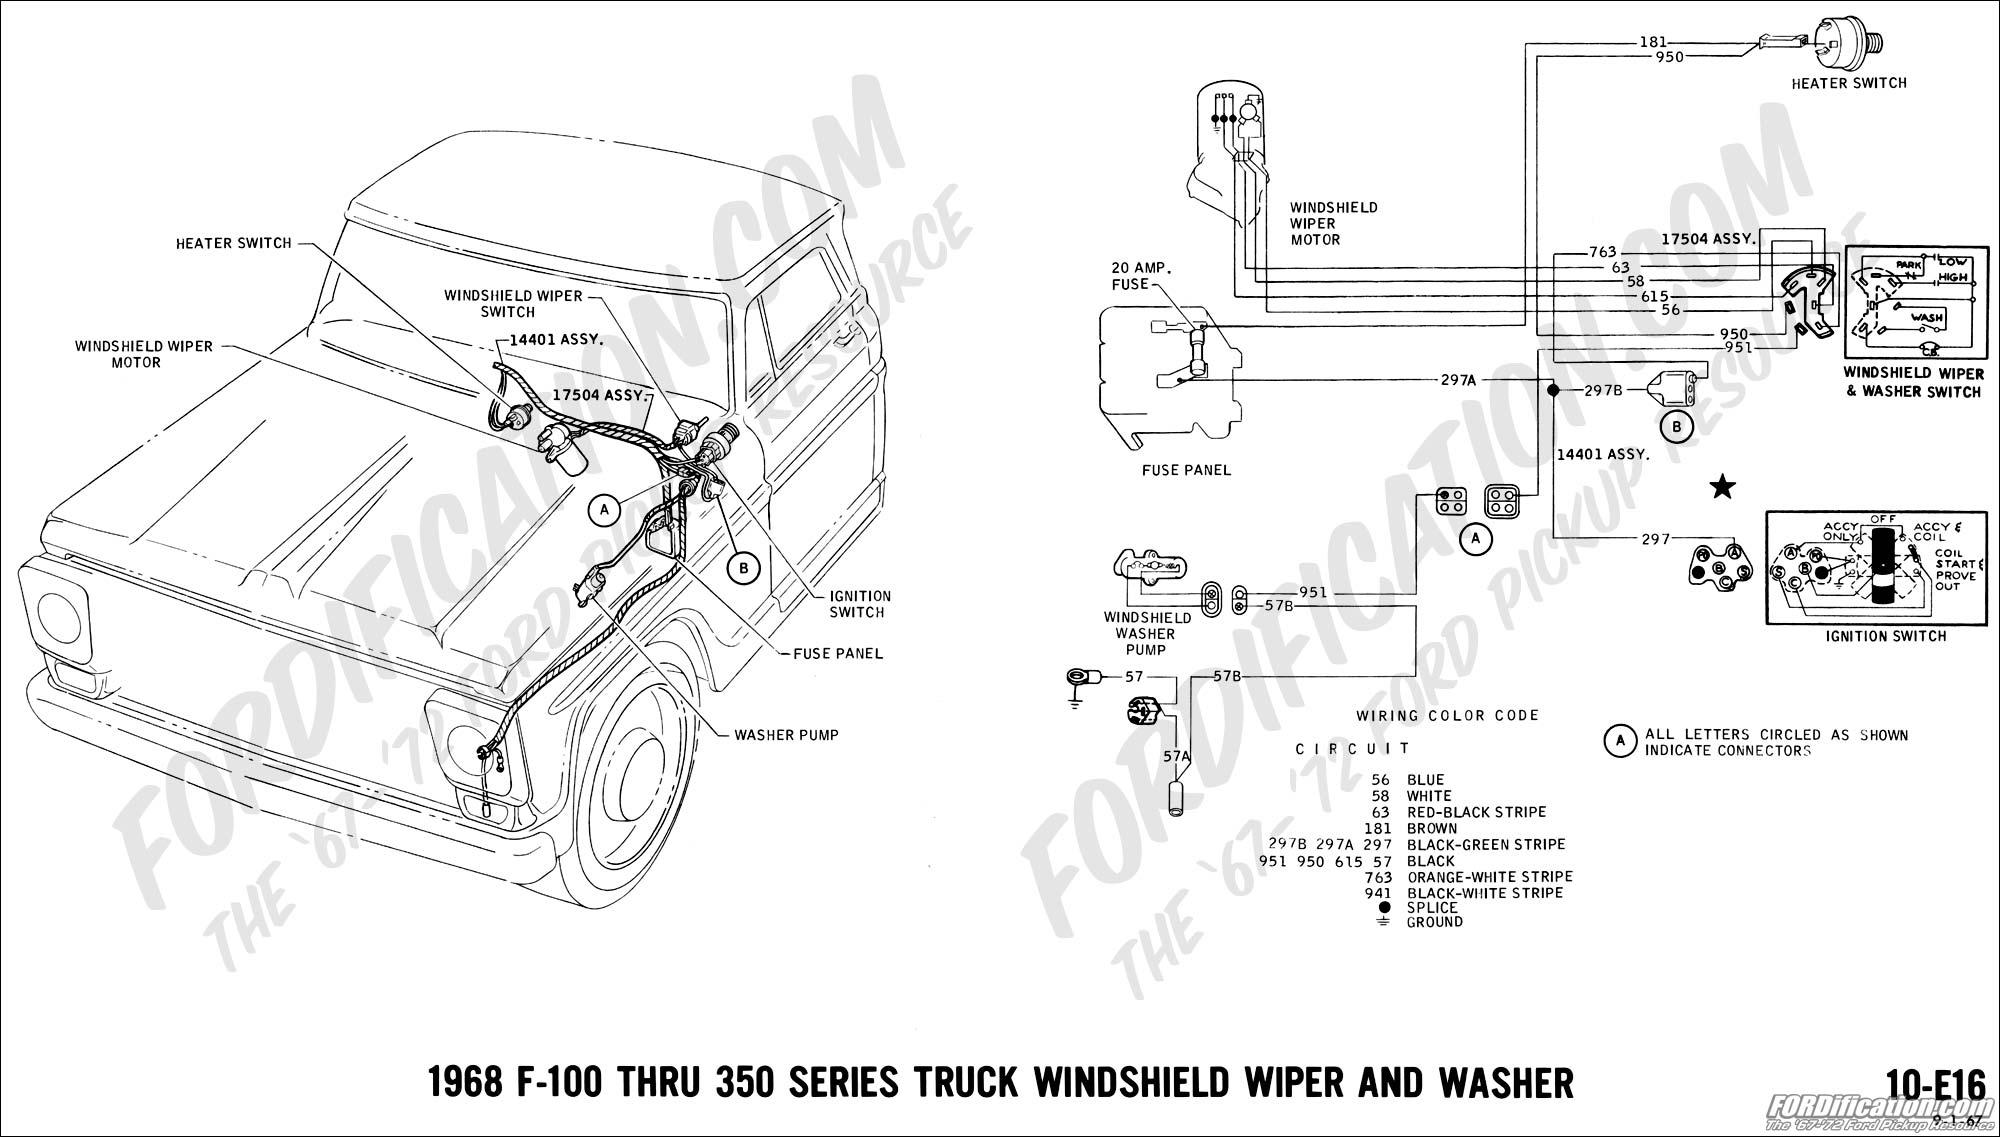 wiper motor wiring diagram on 68 nova wiper motor wiring diagram